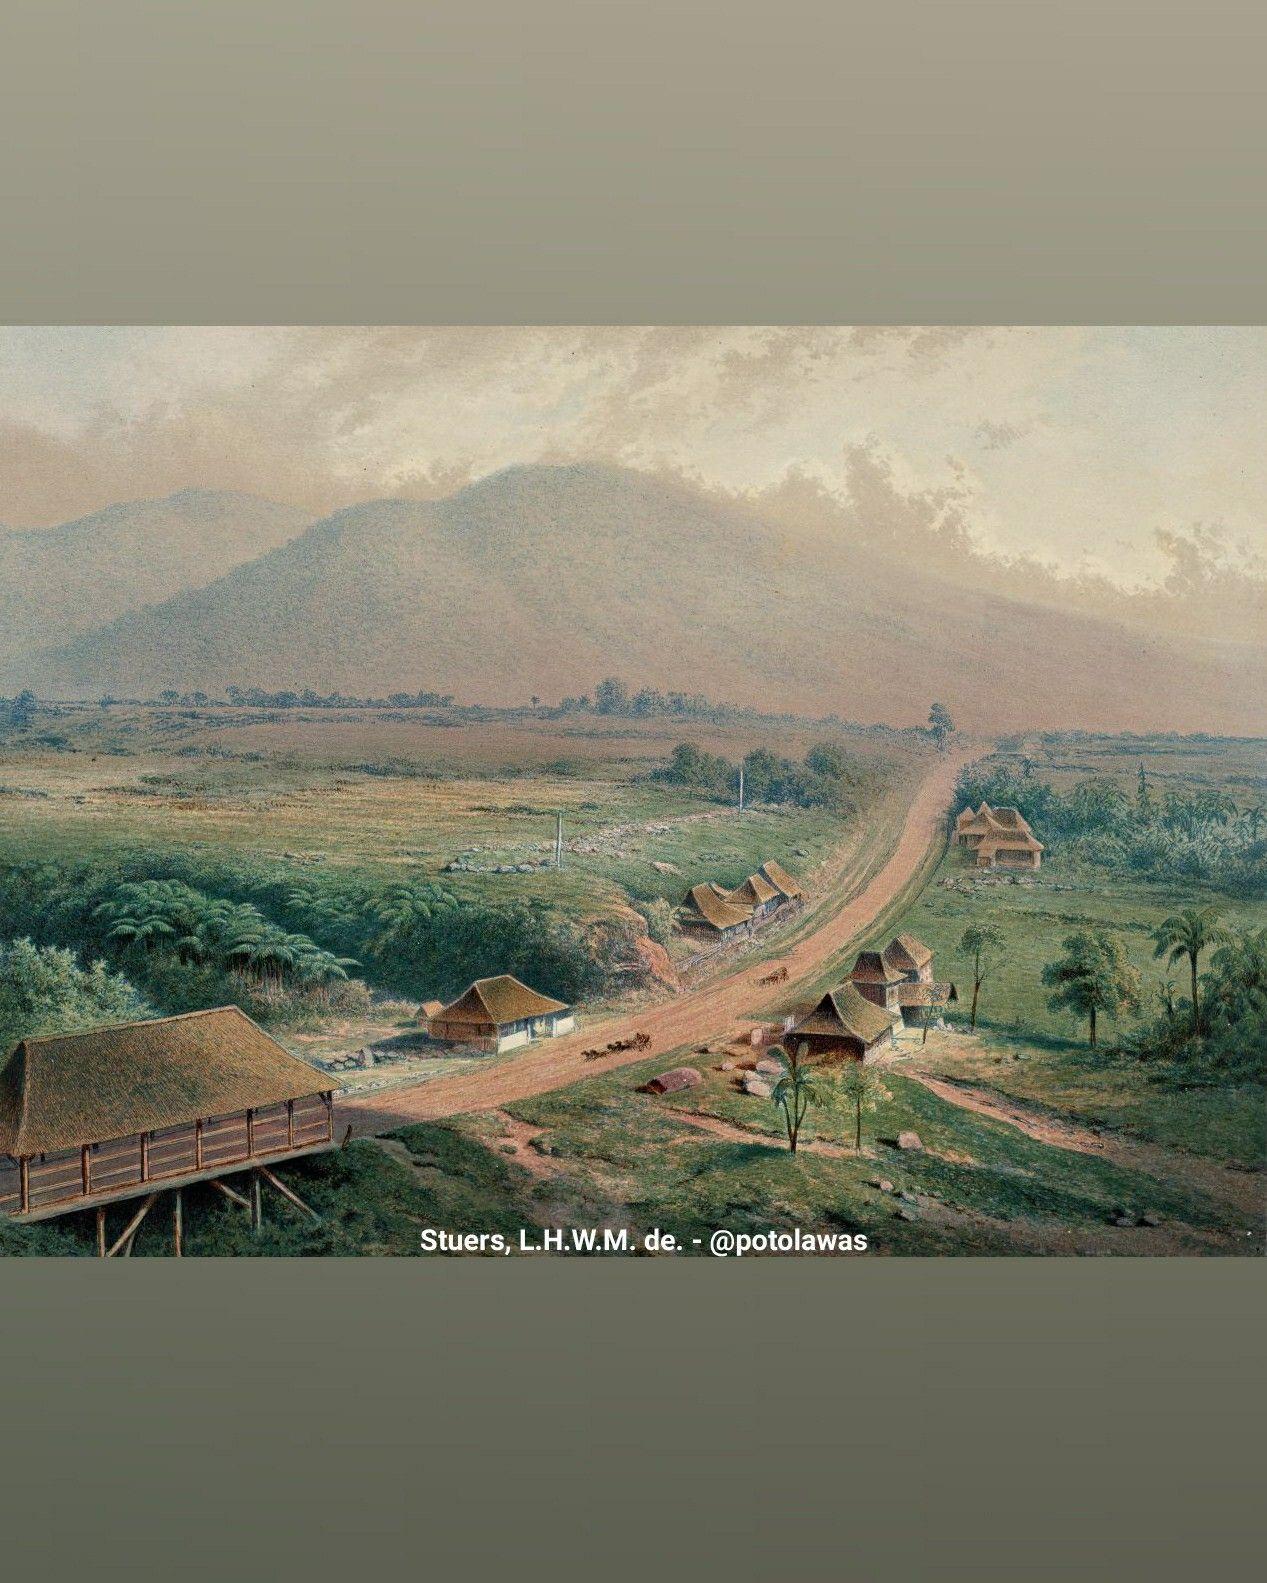 Lukisan Karya L H W M De Stuers Sekitar Tahun 1867 Di Batoe Toelis Buitenzorg Bogor Jawa Barat Pemandangan Jalan D Di 2020 Pemandangan Foto Zaman Dulu Litografi